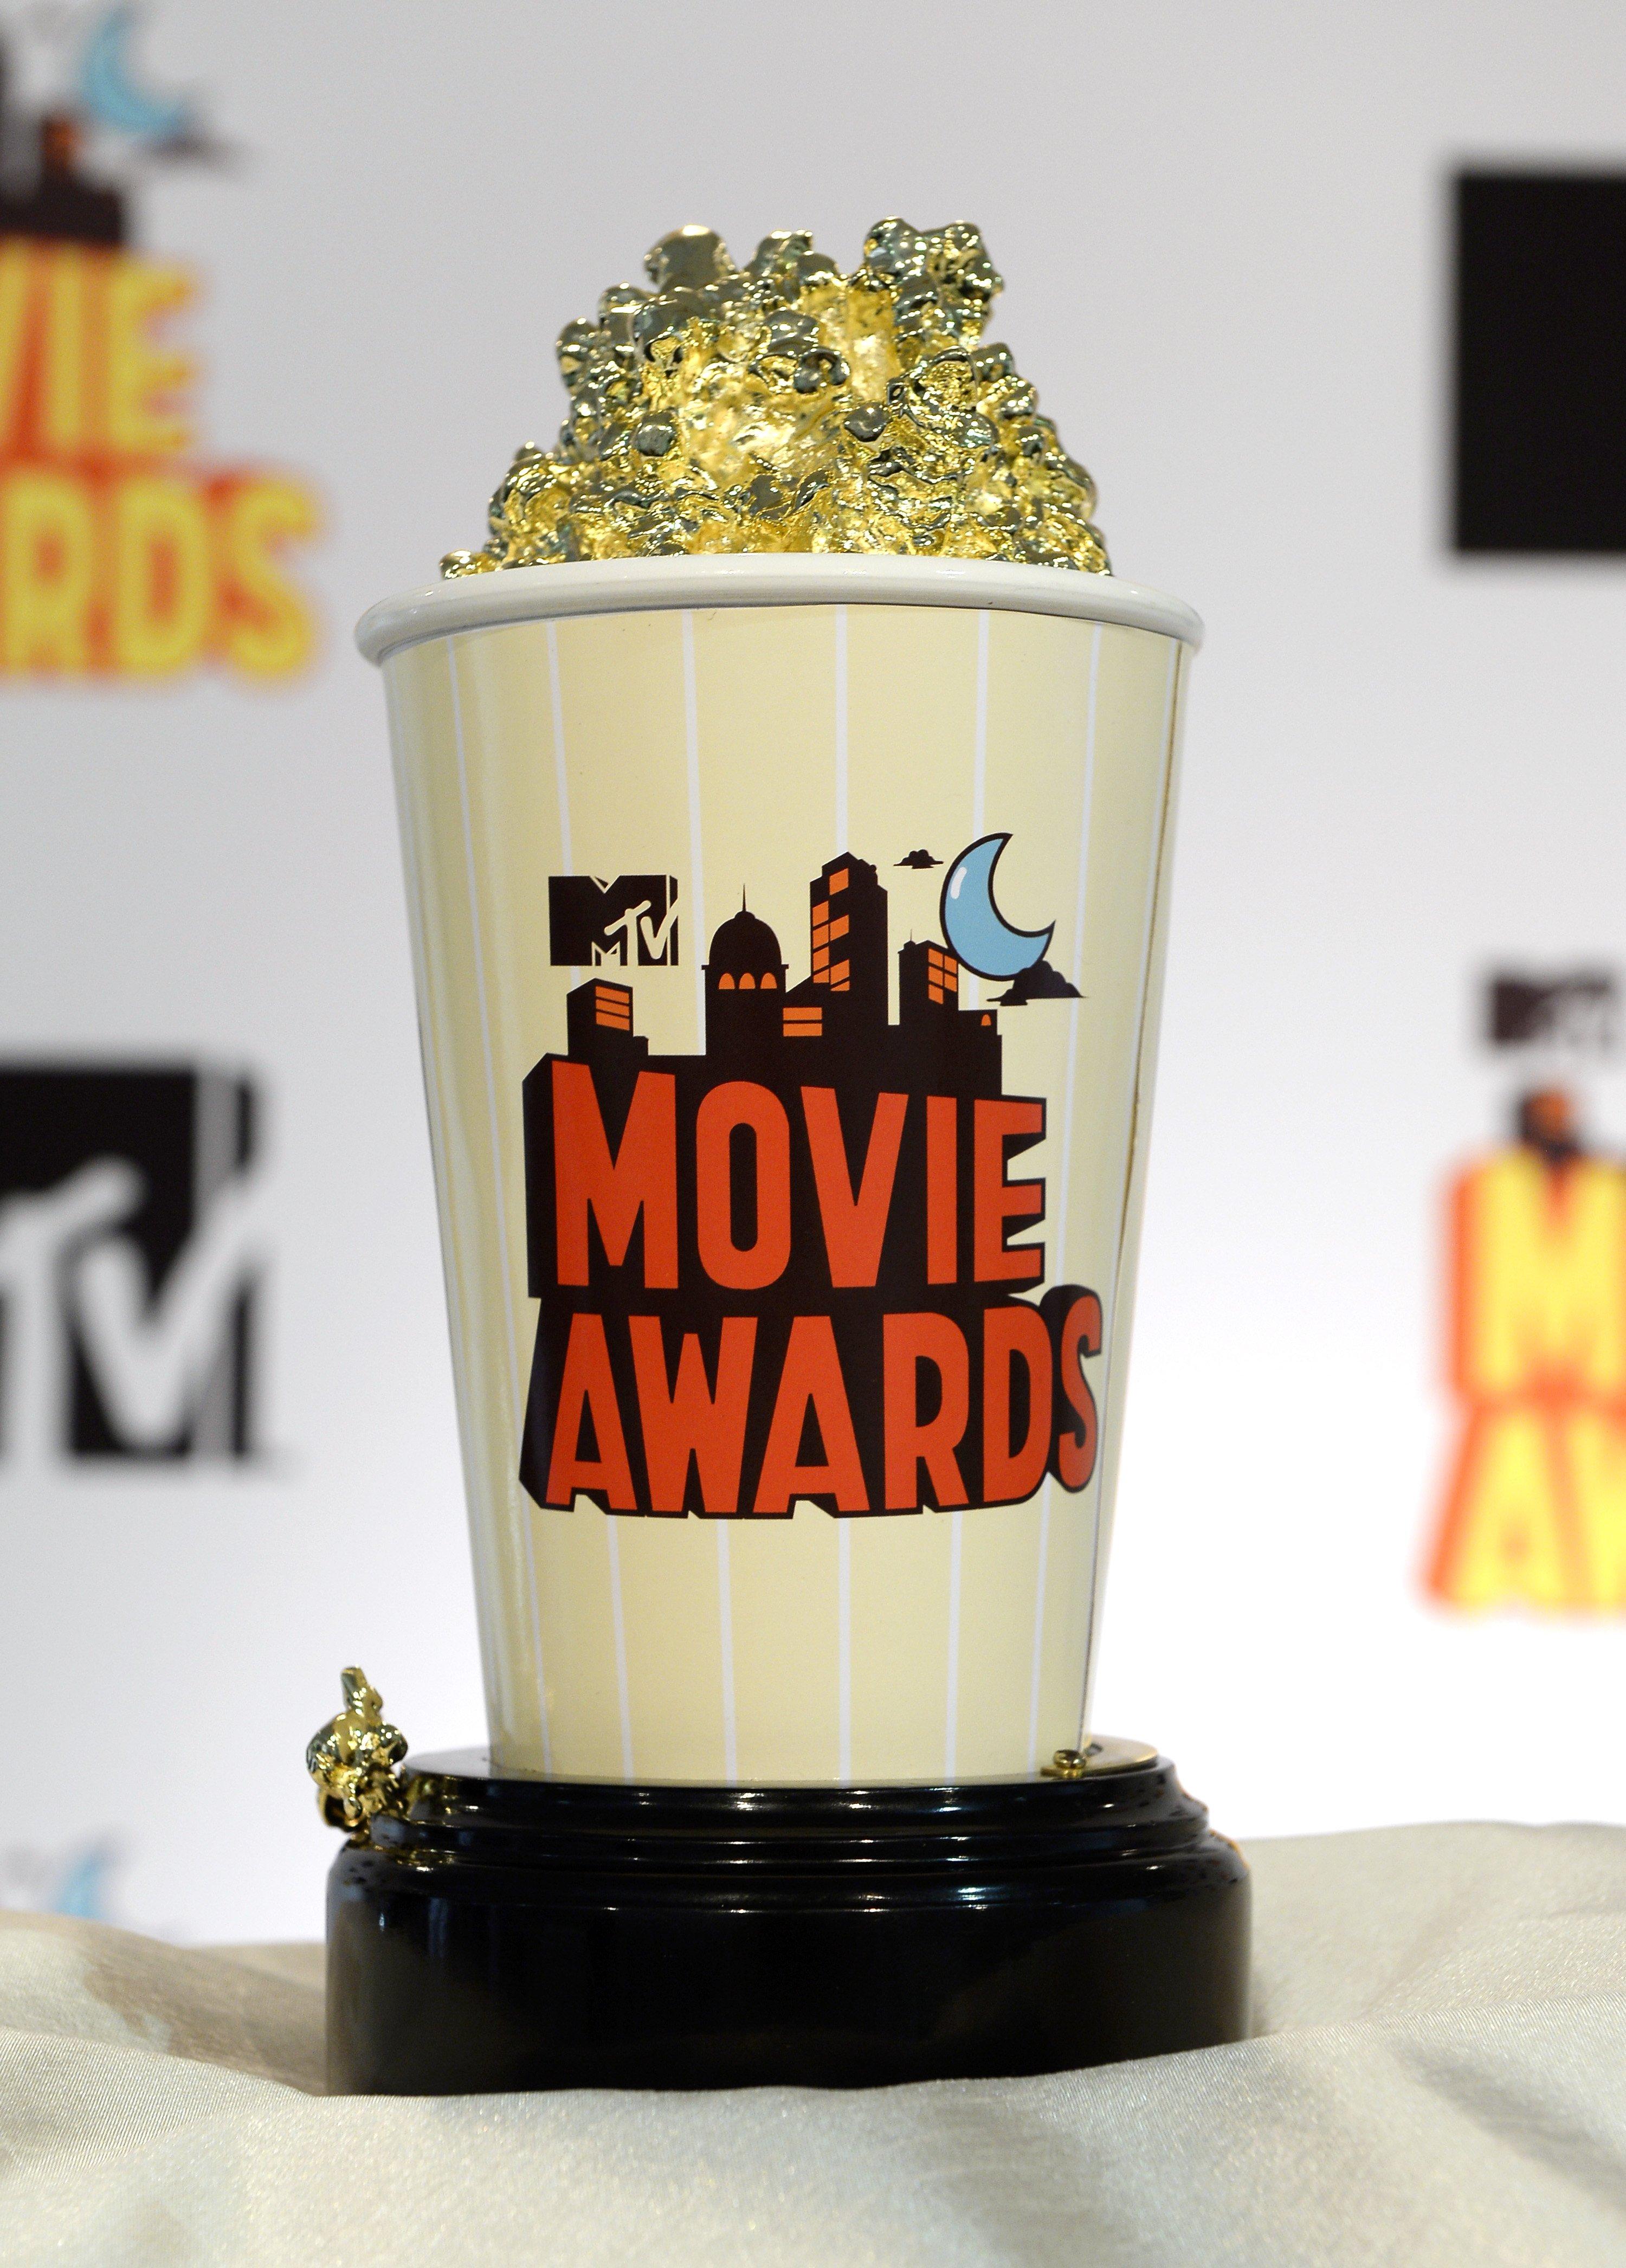 The 2015 MTV Movie Awards Golden Popcorn trophy is displayed during an MTV Movie Awards press junket April 9, 2015, in Los Angeles